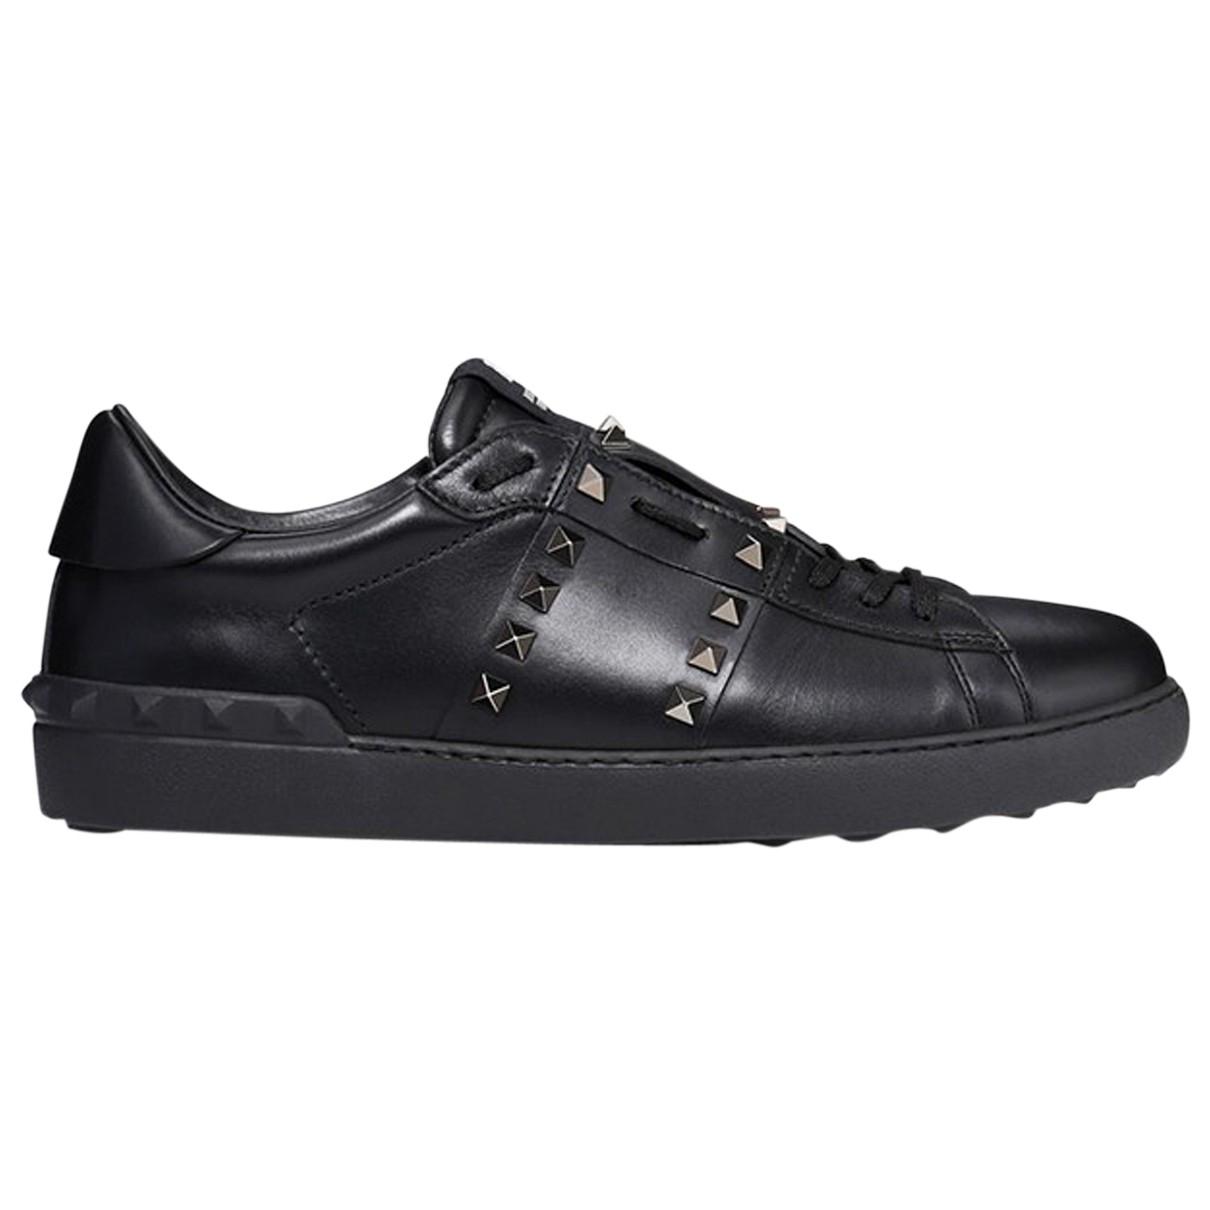 Valentino Garavani Rockstud Black Leather Trainers for Men 40.5 EU